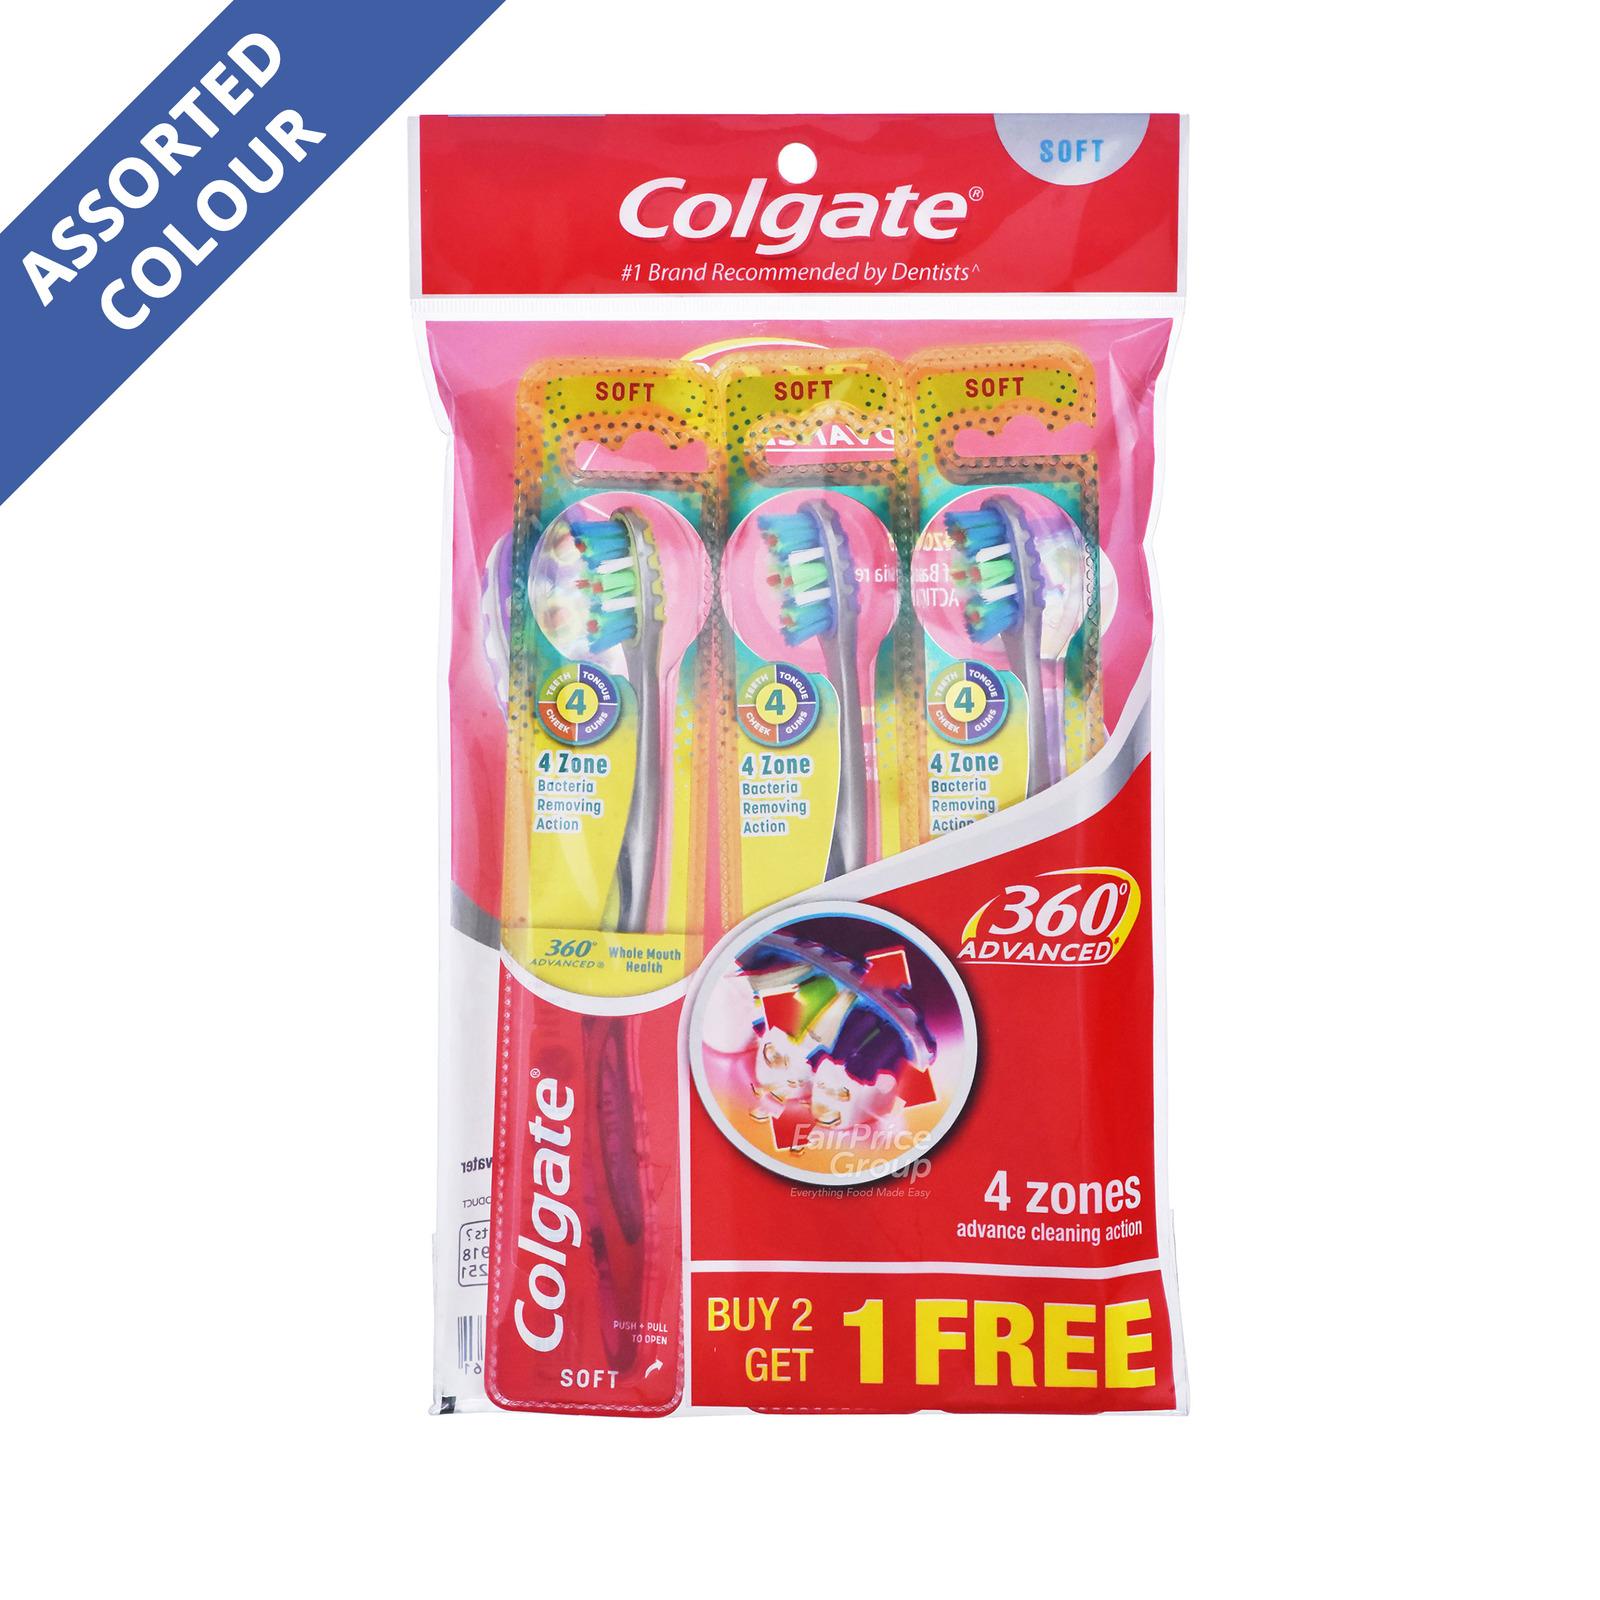 Colgate 360 Advanced Toothbrush - Soft